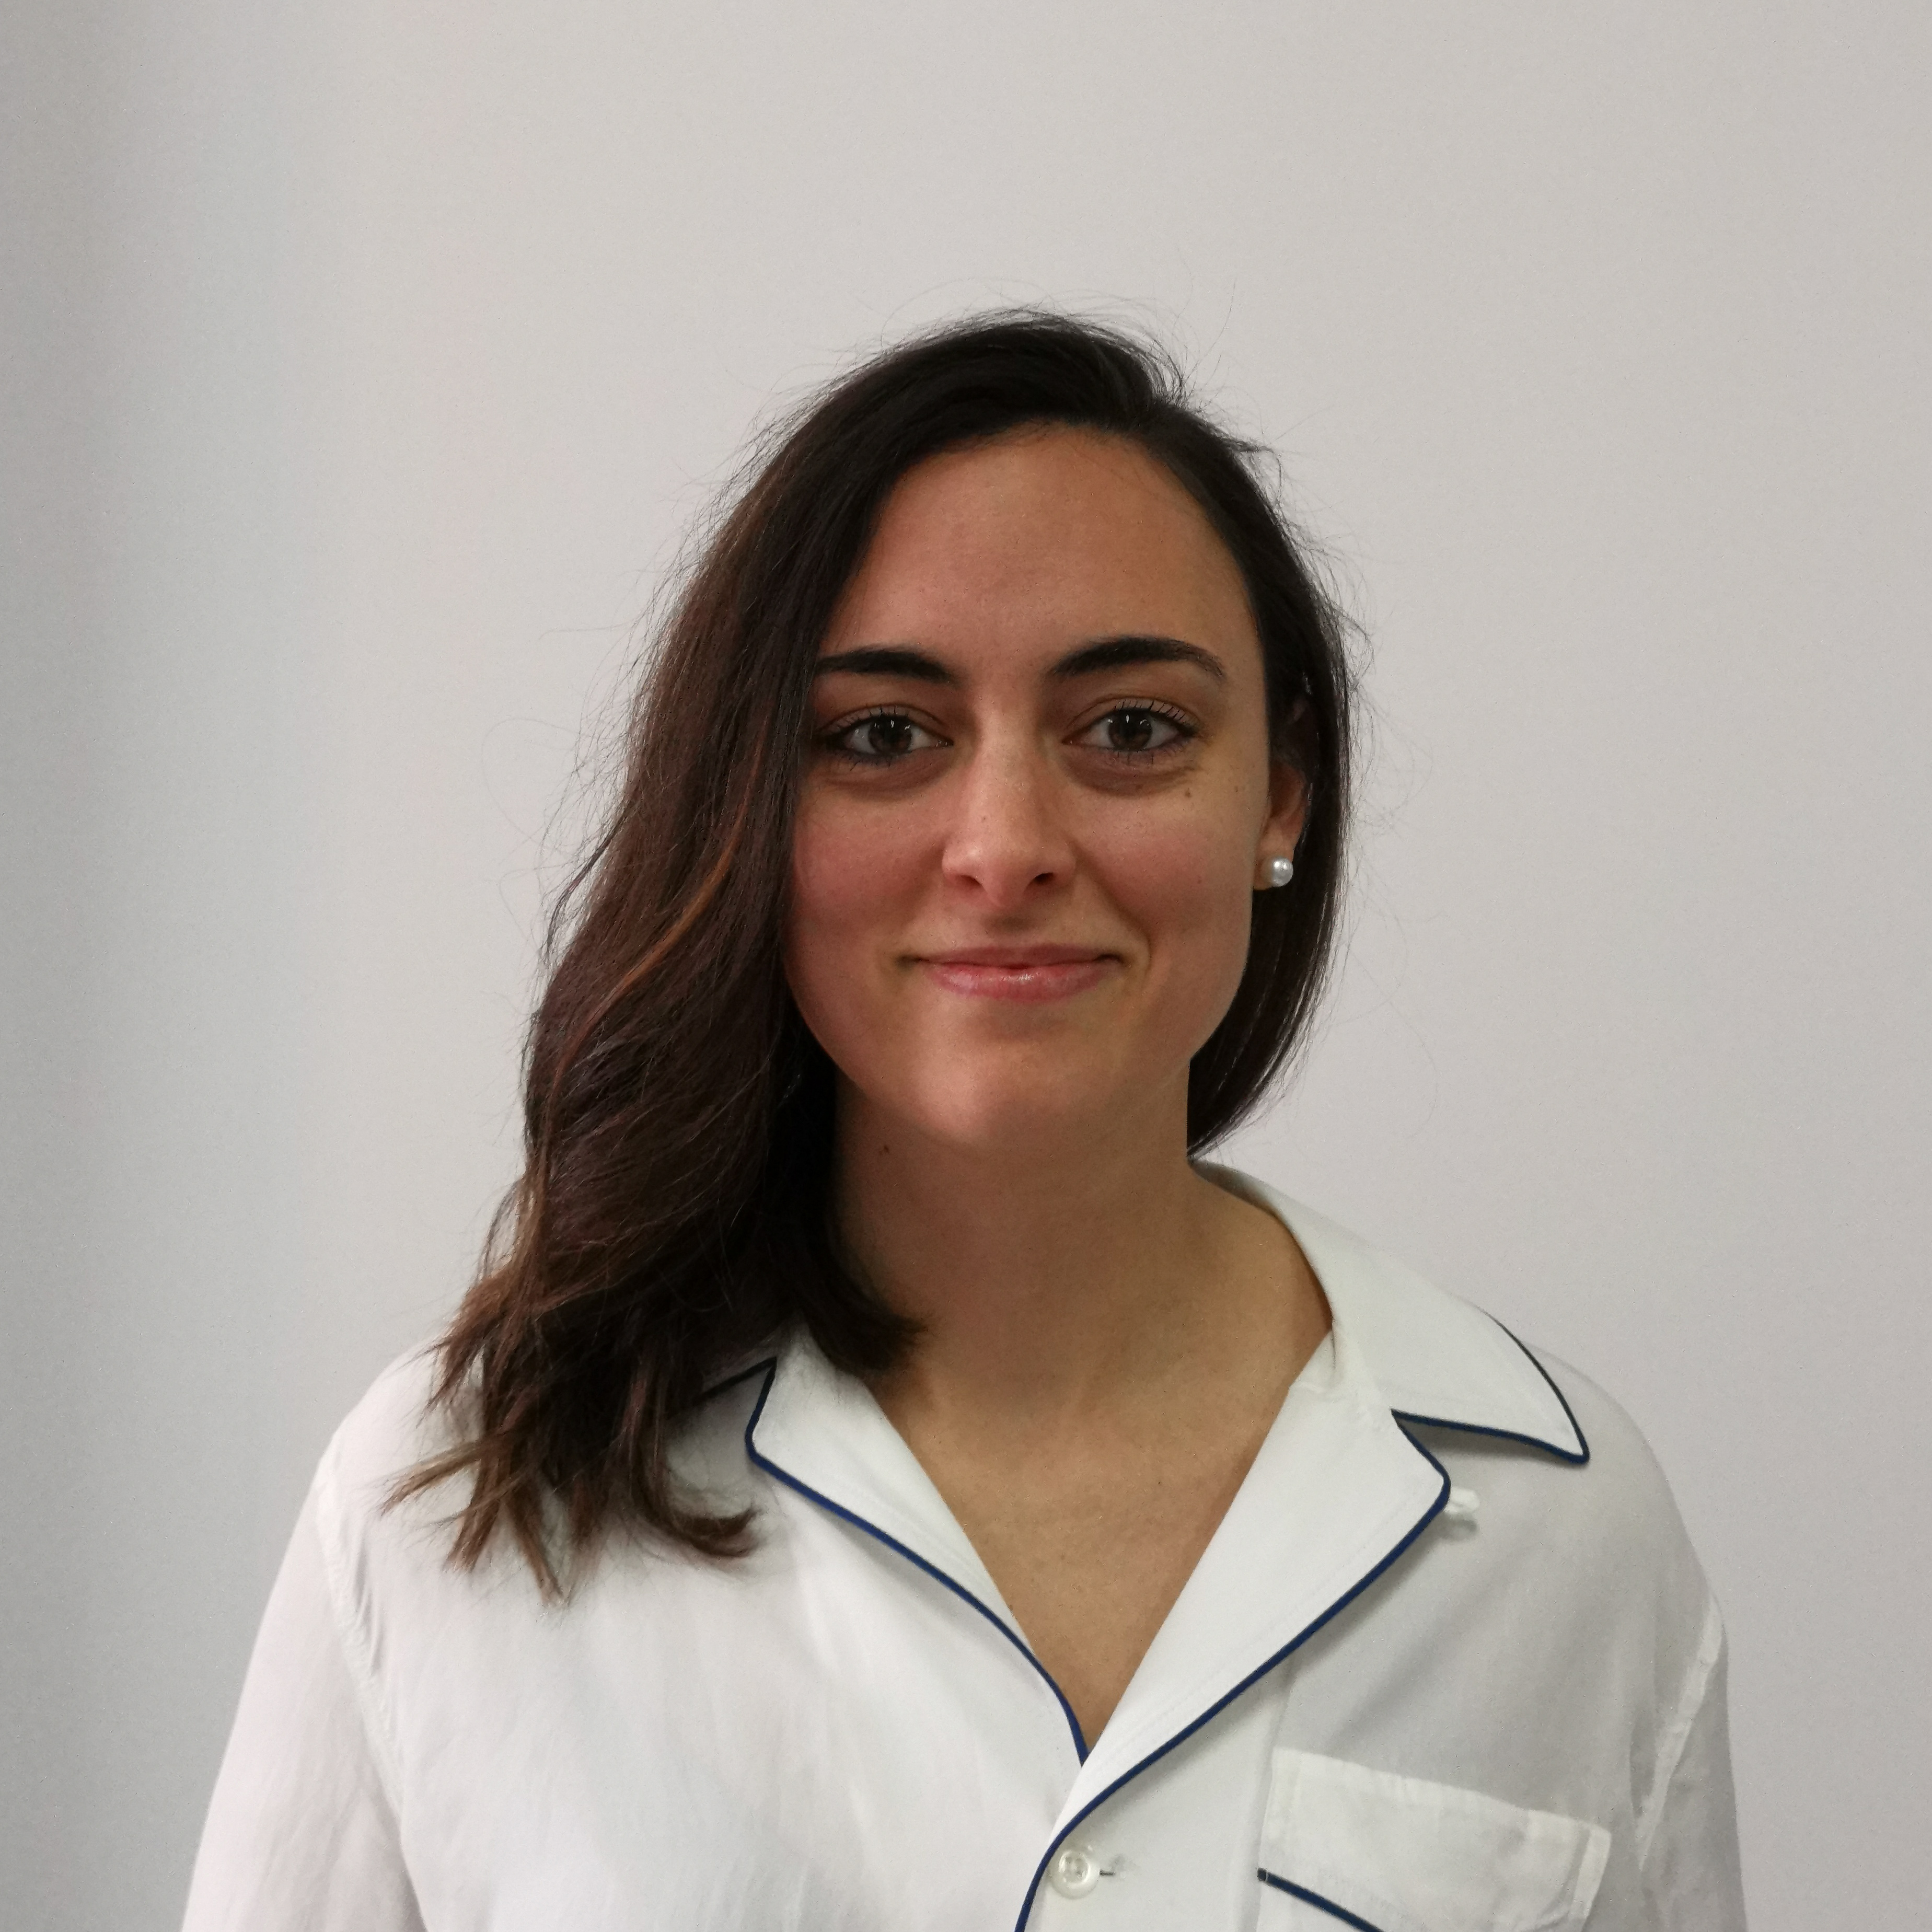 Élizabeth Robillard